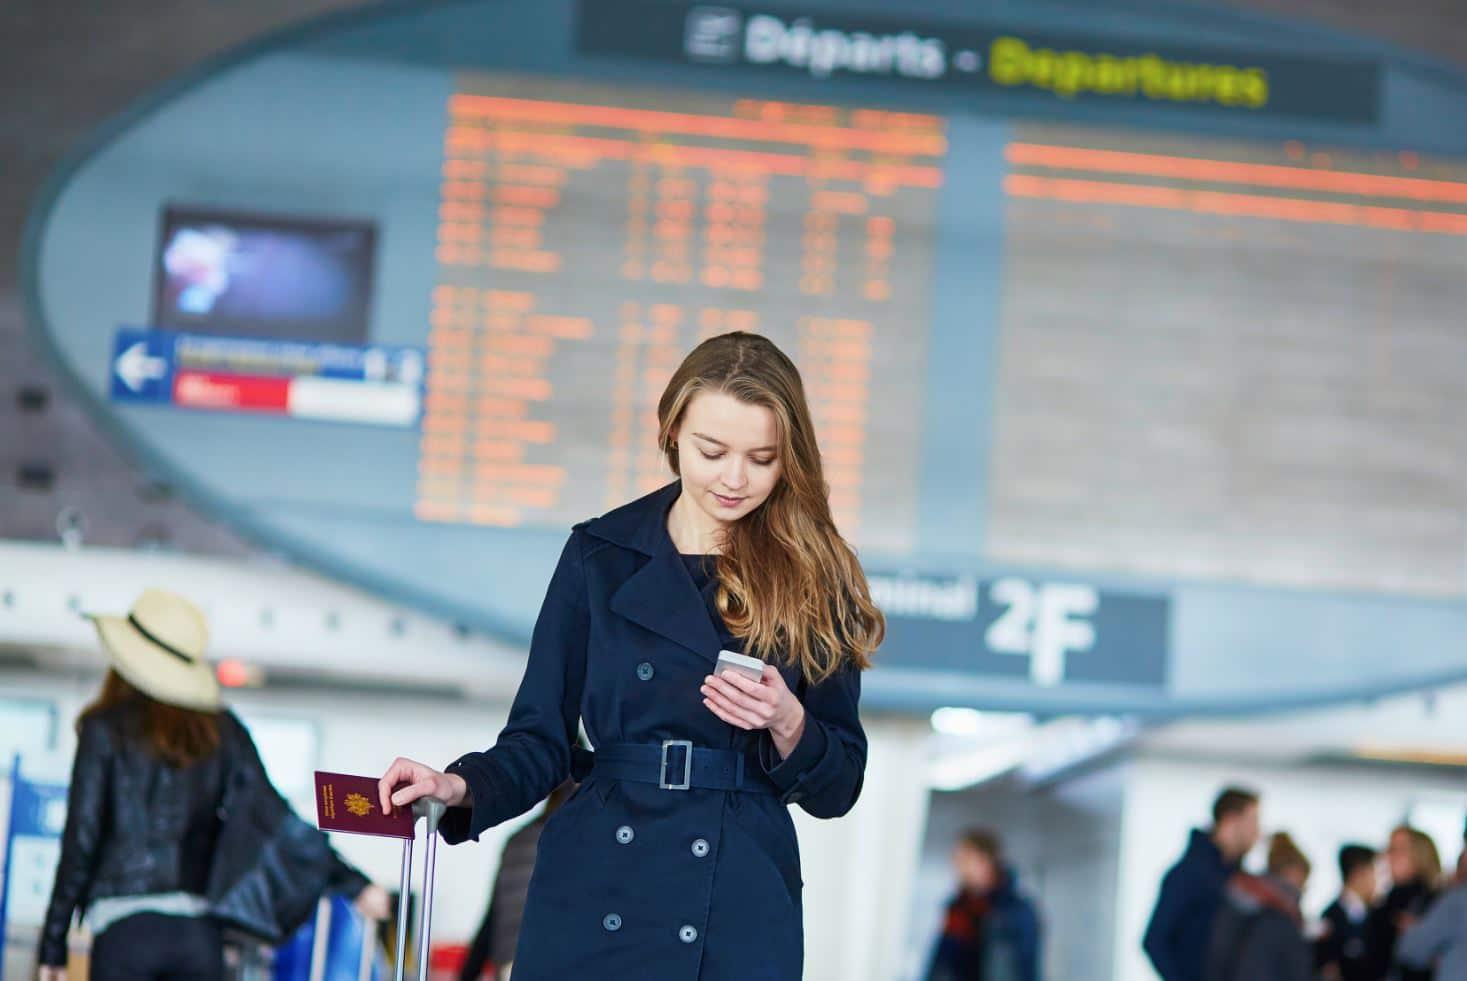 Femme Aeroport Telephone